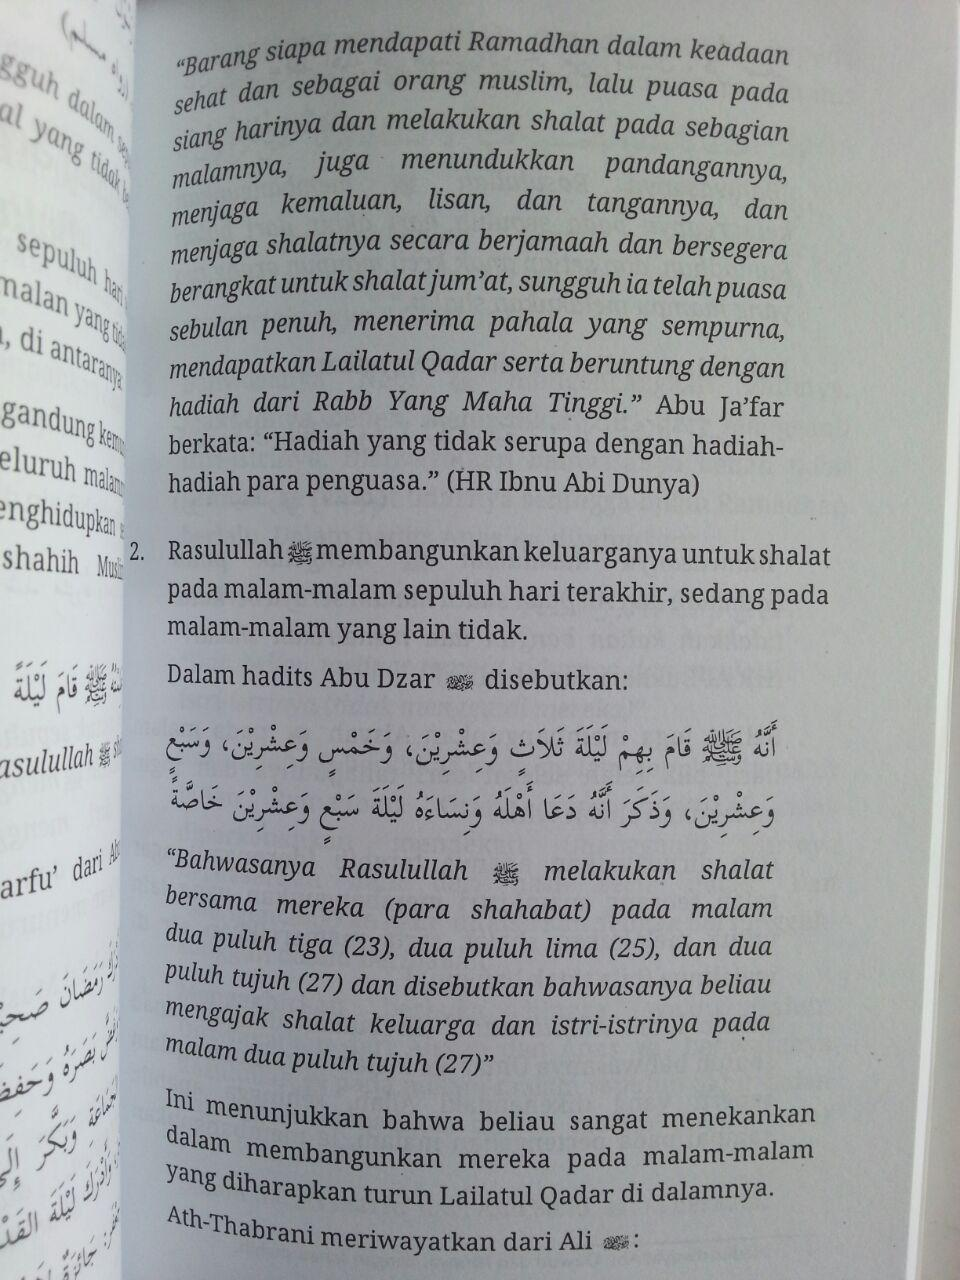 Buku Risalah Ramadhan Materi Kultum Sebulan isi 3